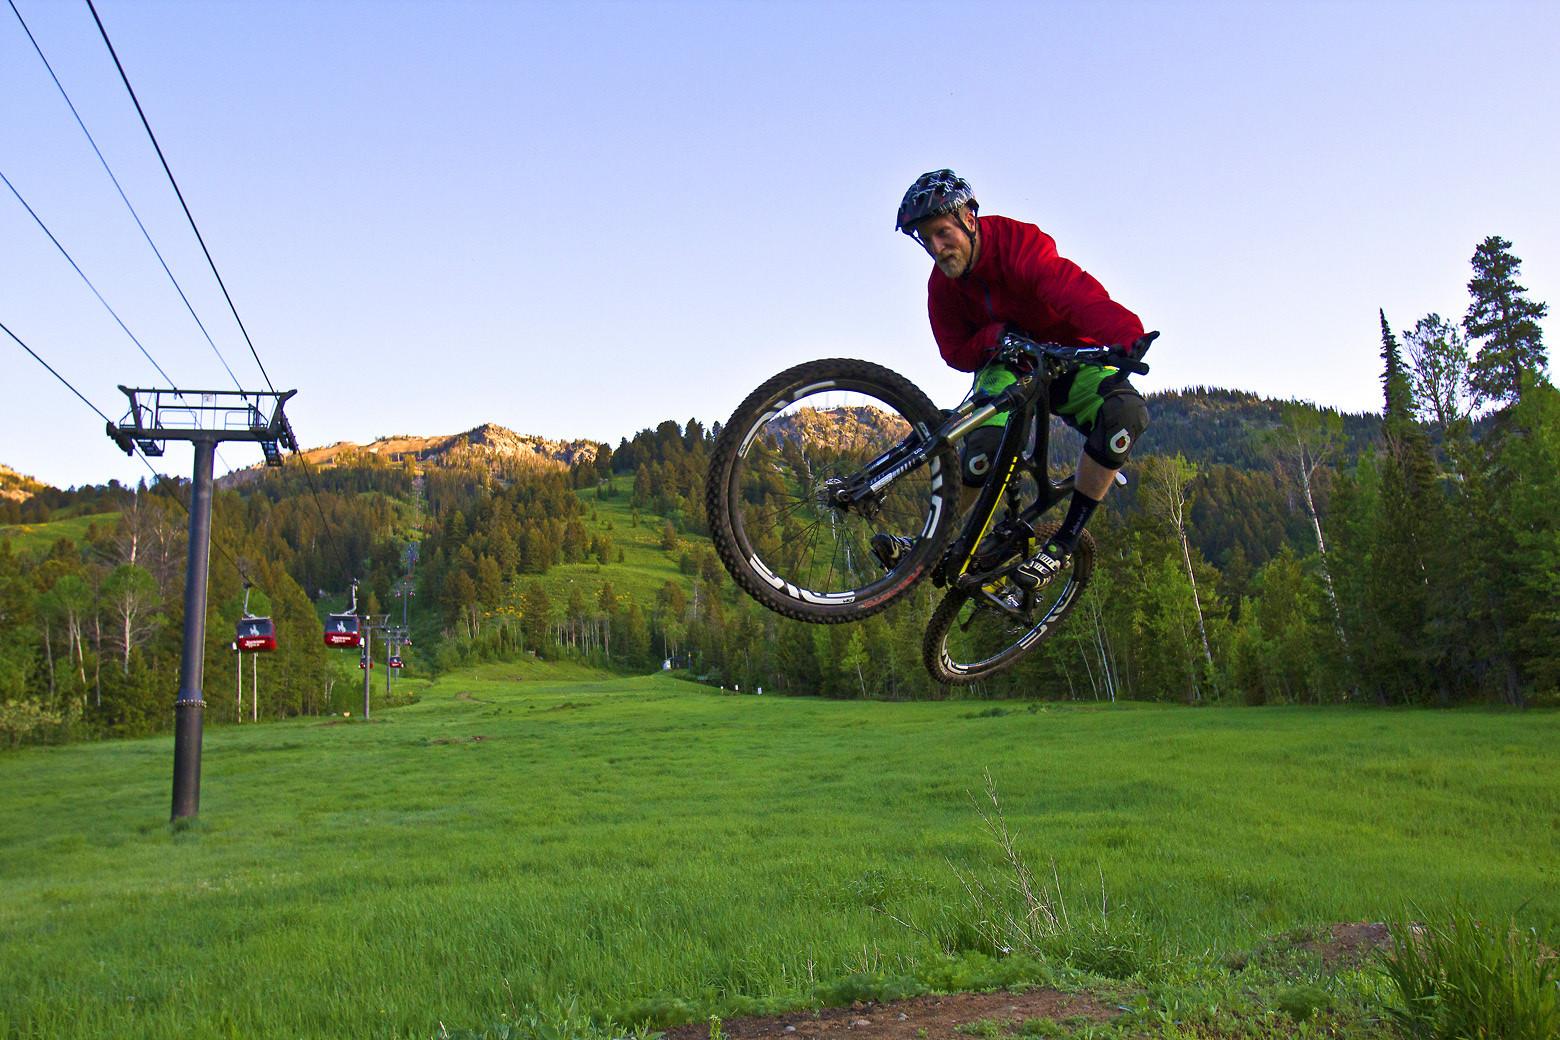 Andrew Whiteford enjoying the smooth flow on Bandit - jacksonholemountainresort - Mountain Biking Pictures - Vital MTB